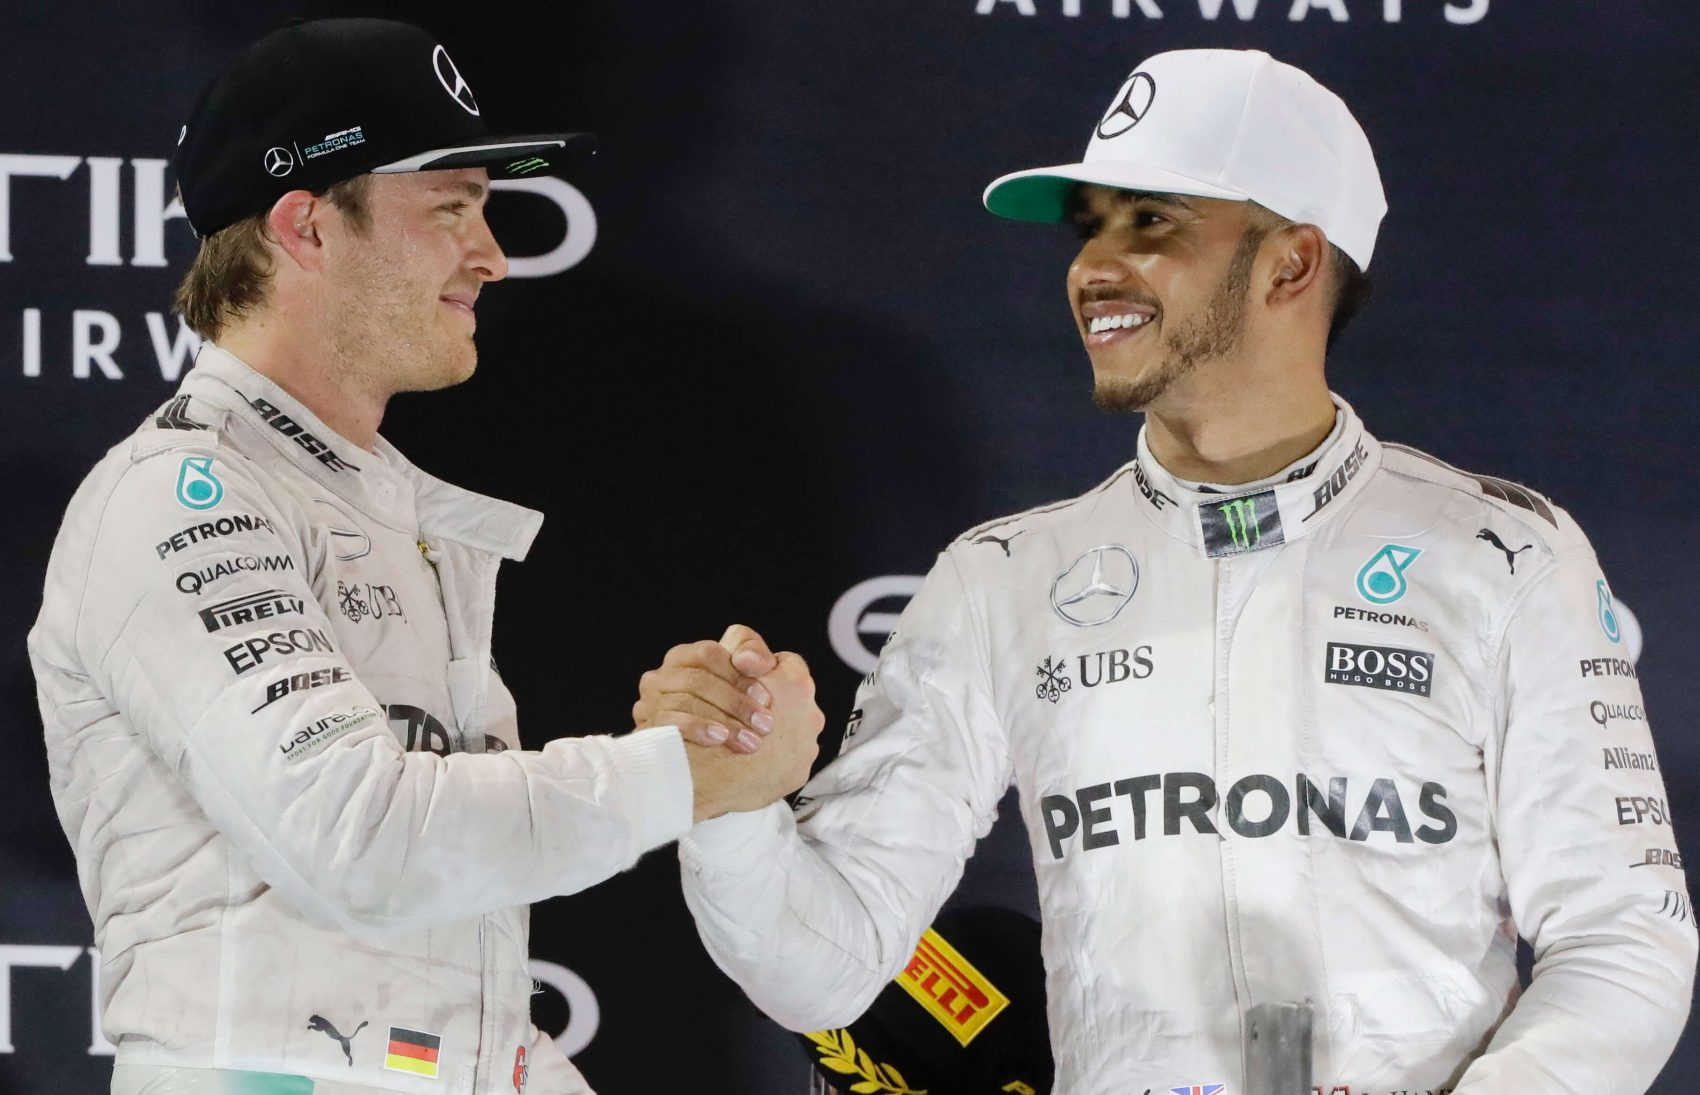 Hamilton neprehral titul v Malajzii